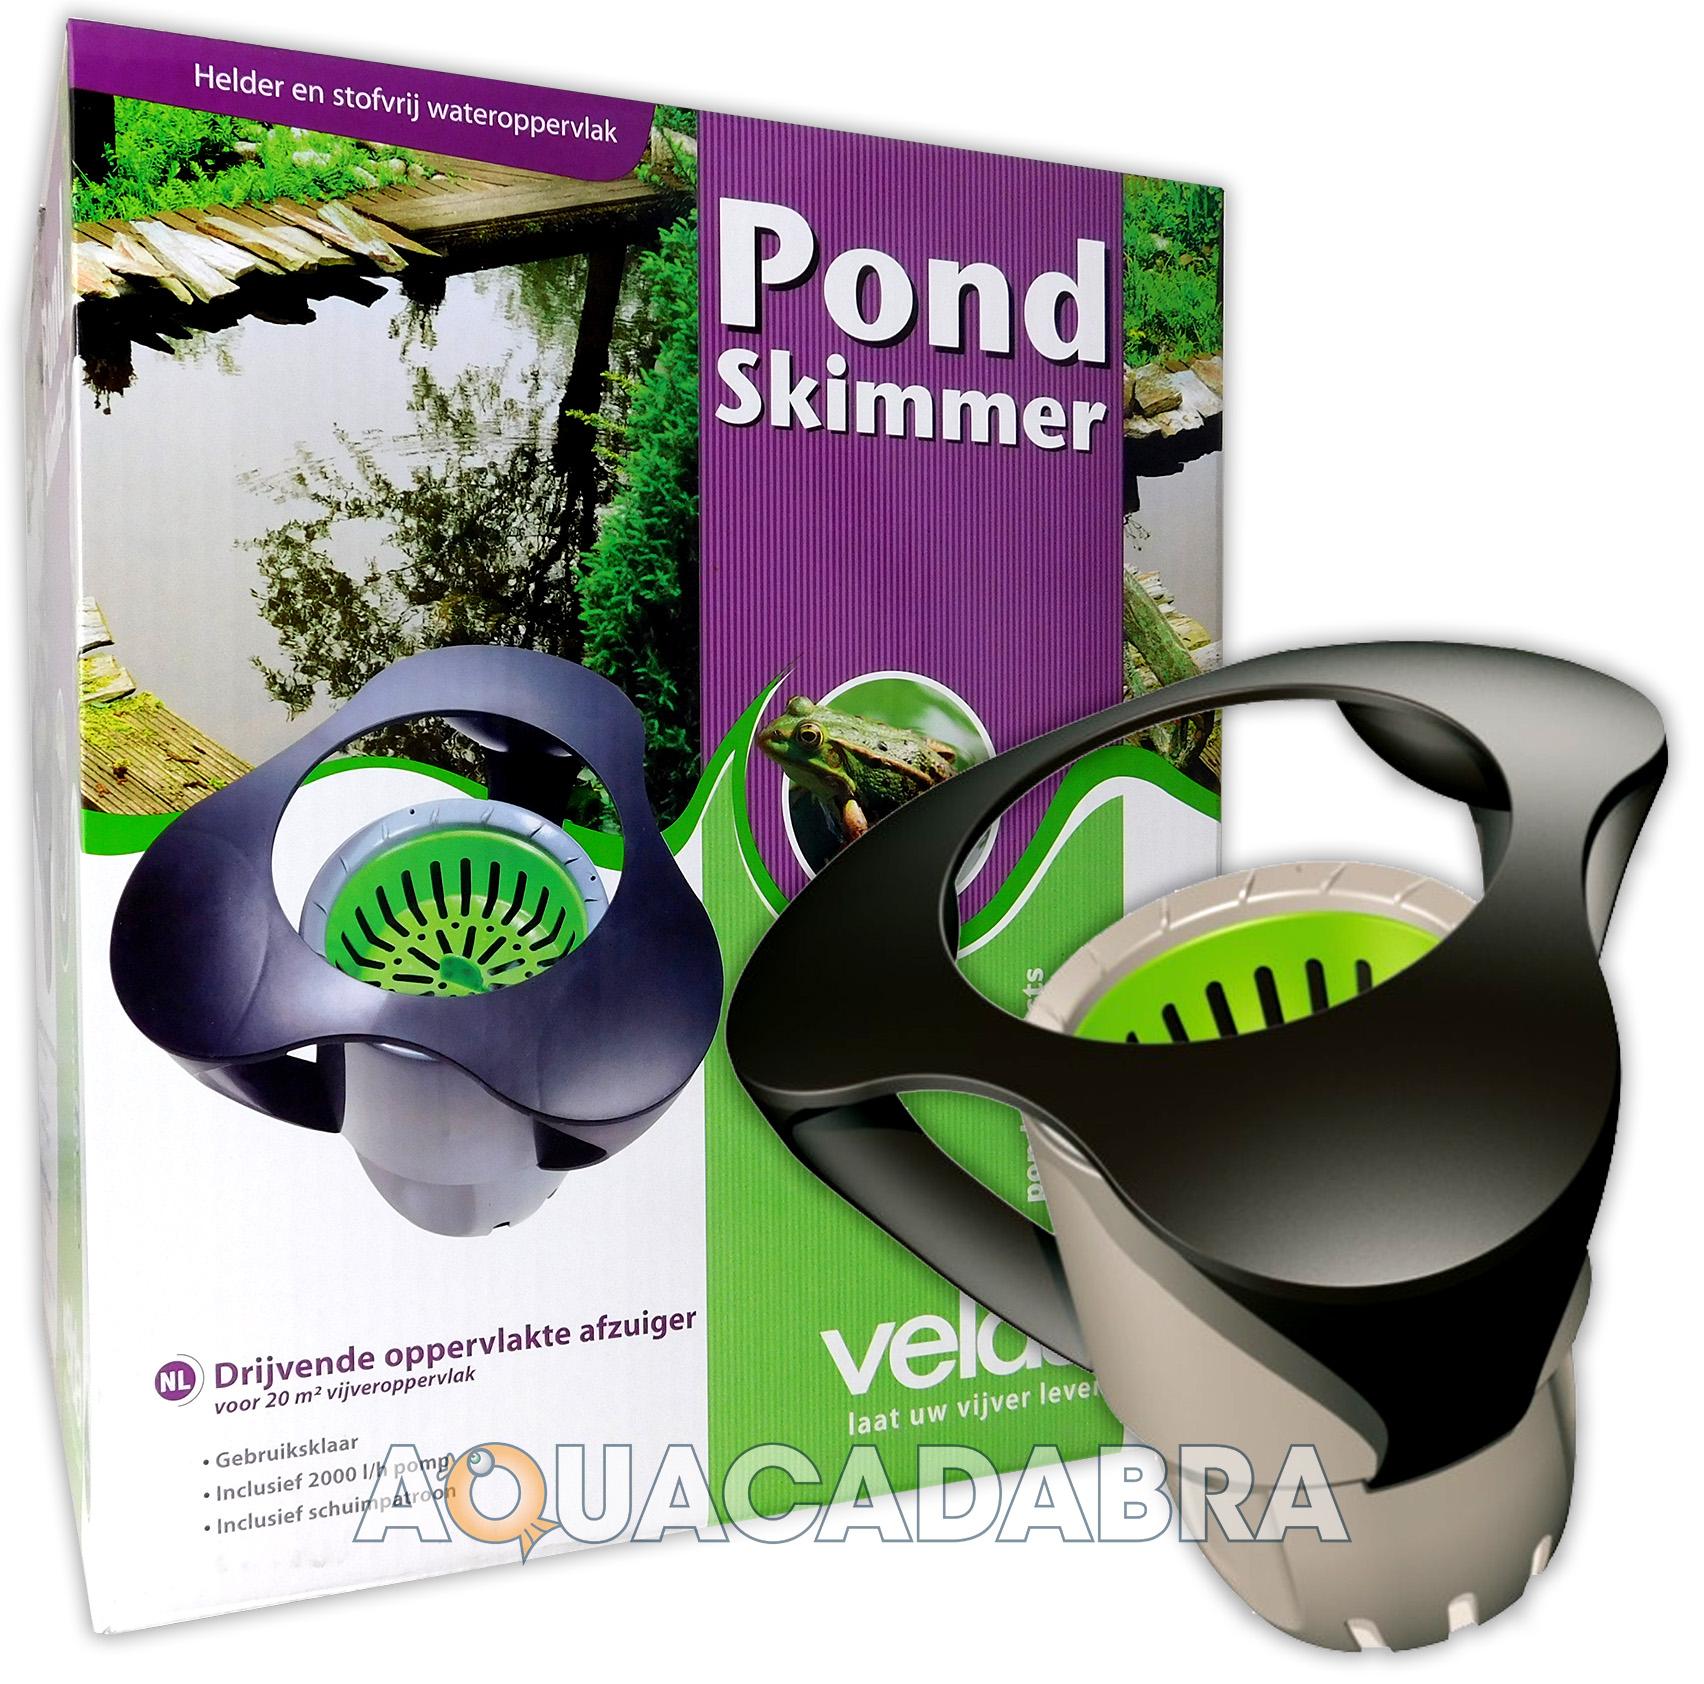 Velda pond surface skimmer built in pump floating clean for Garden pond skimmer